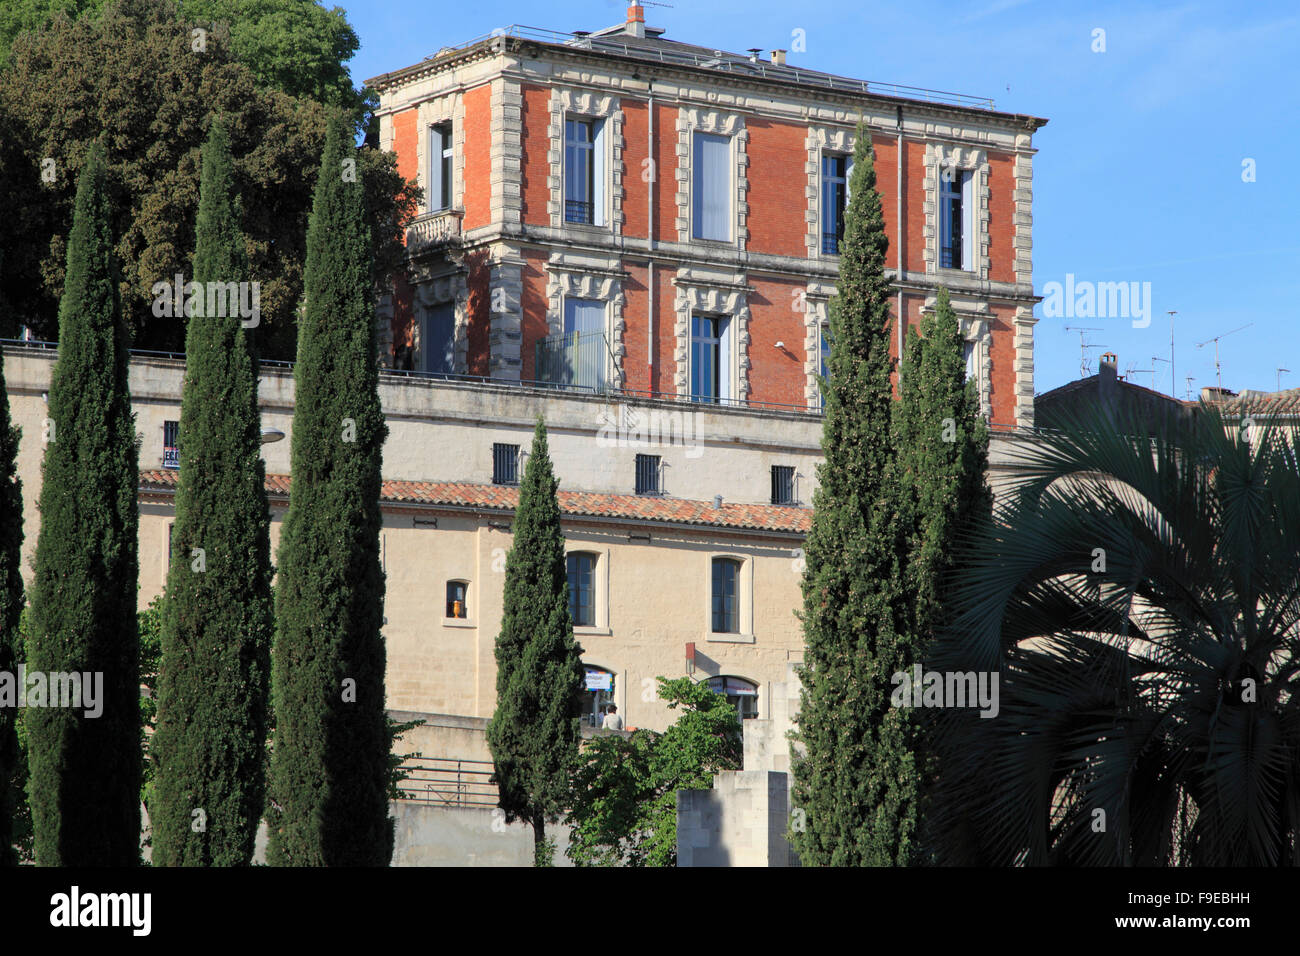 France, Languedoc-Roussillon, Montpellier, Maison des Relations Internationales, - Stock Image